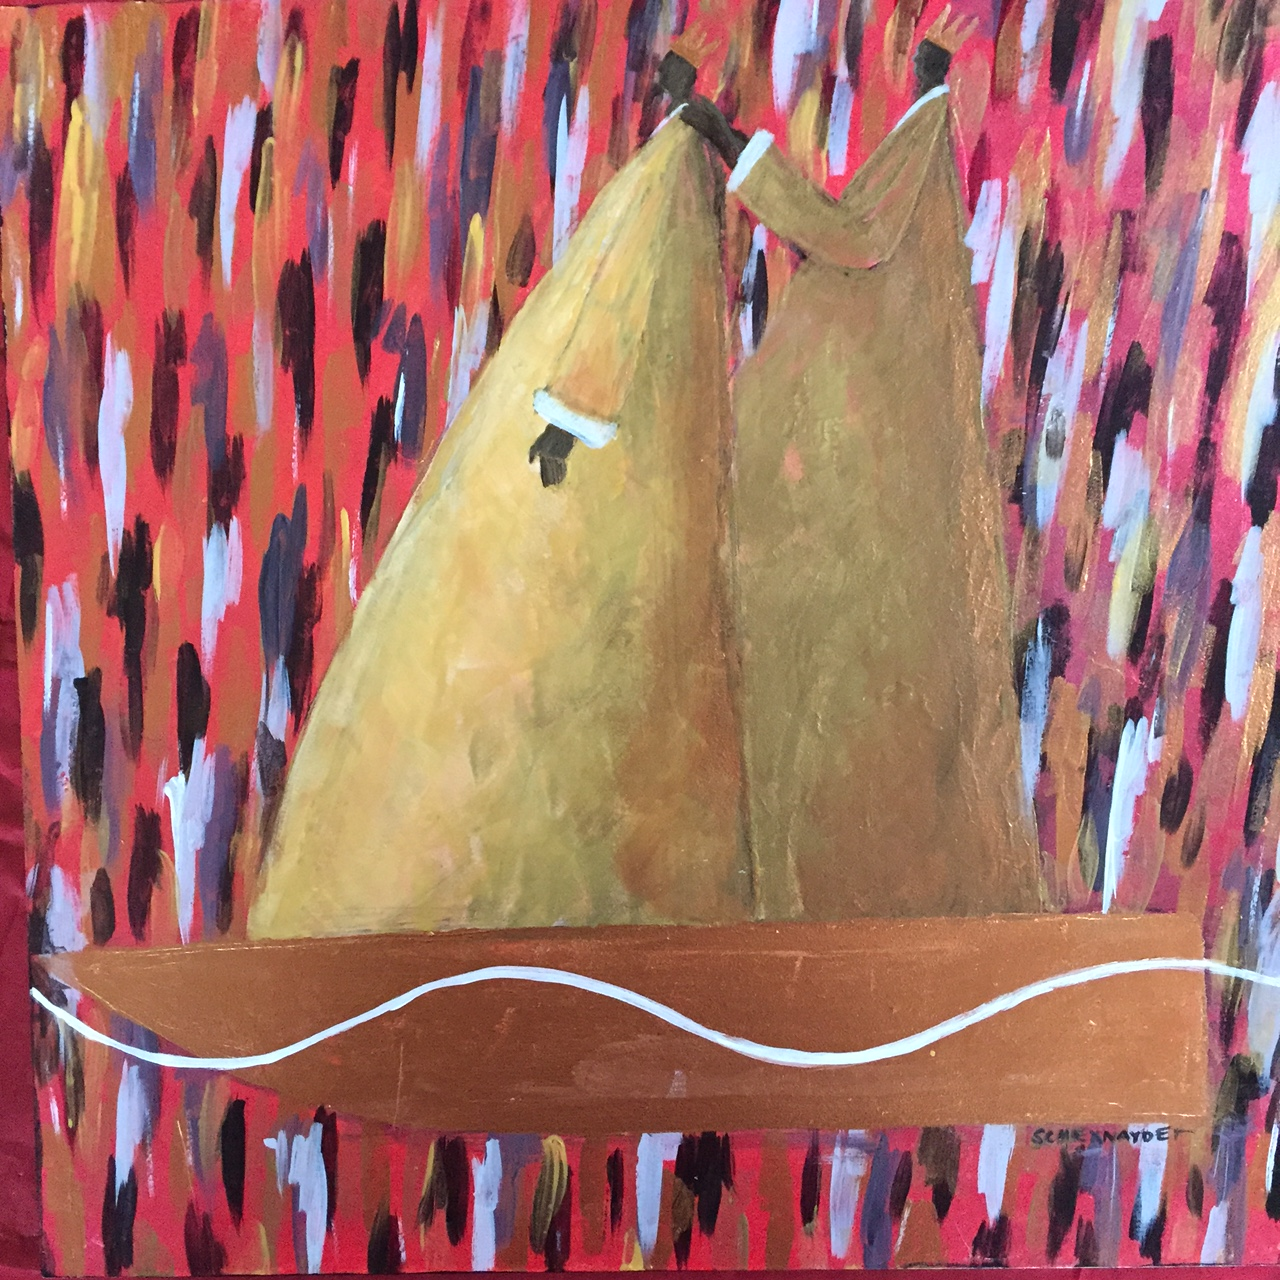 Mates acrylic on wood 14 x 14.JPG